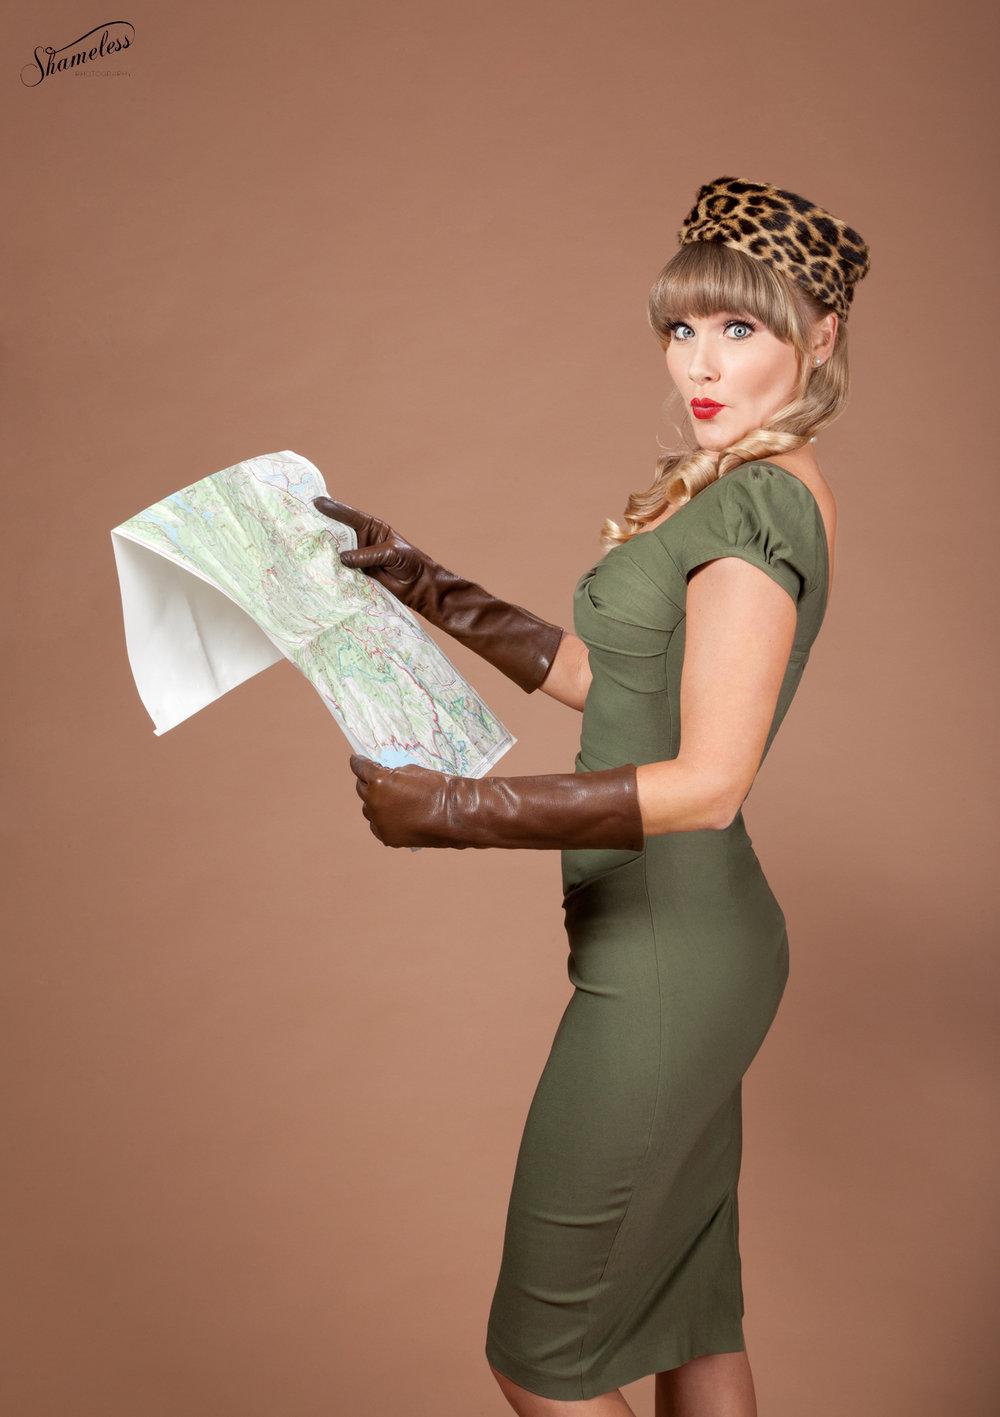 Carrie-WebReady-CareyLynne-08.jpg